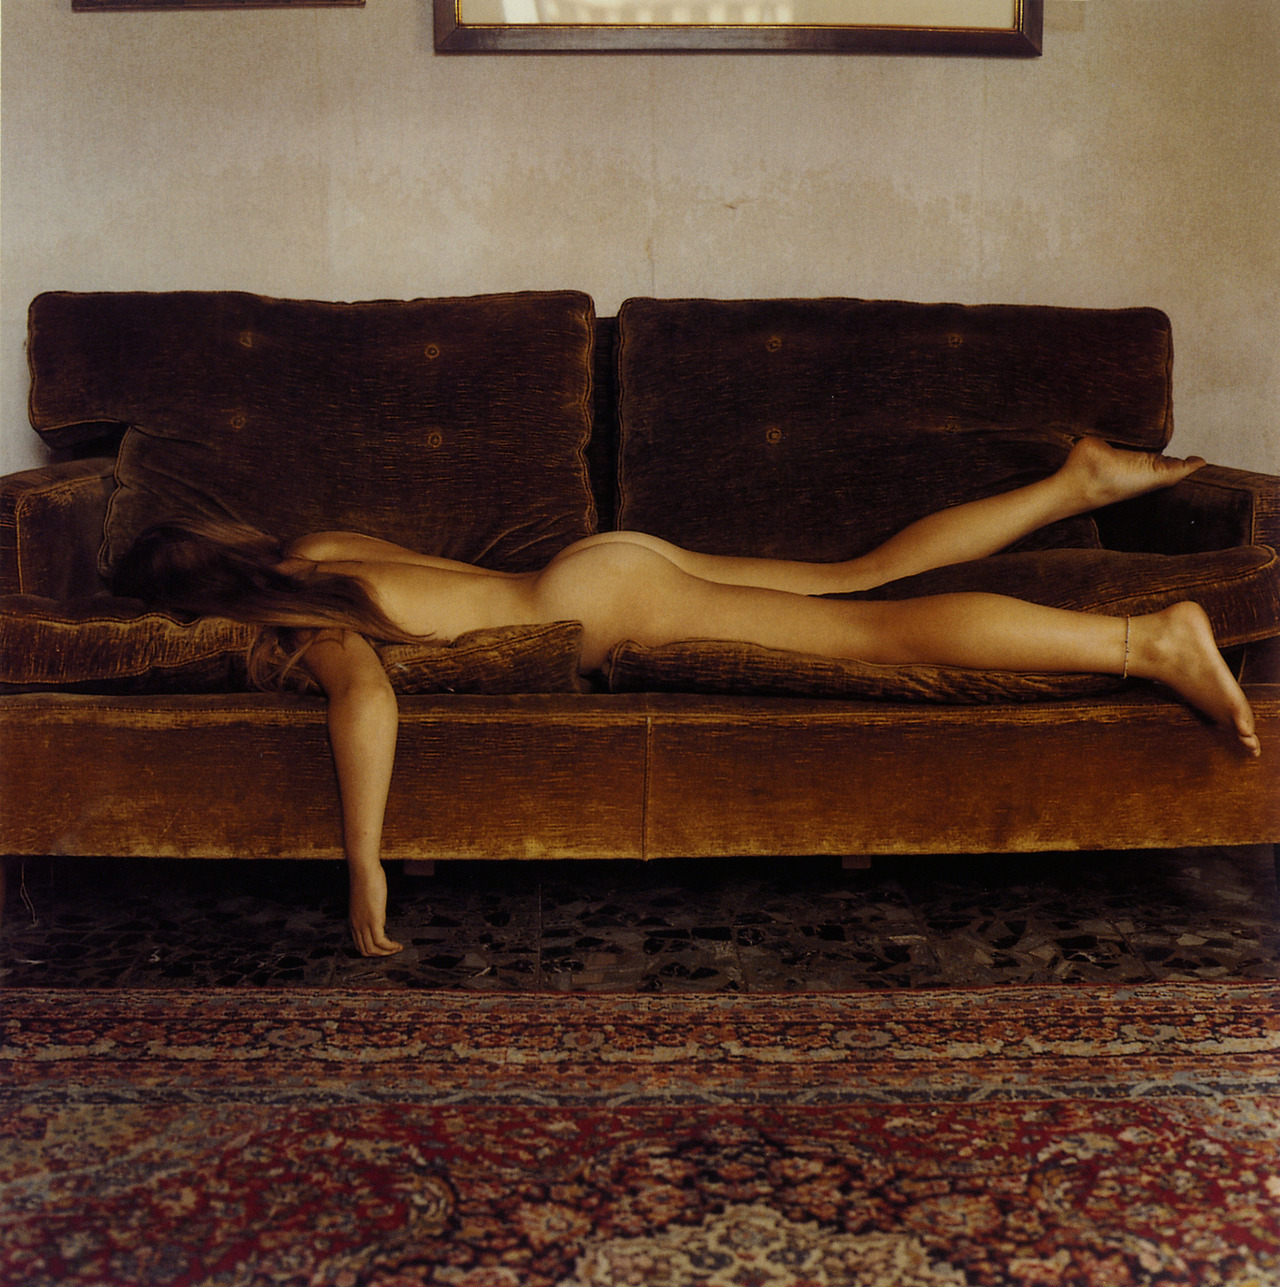 Niki_Berg-Karina_on_Couch-1980-blackshivers.jpg